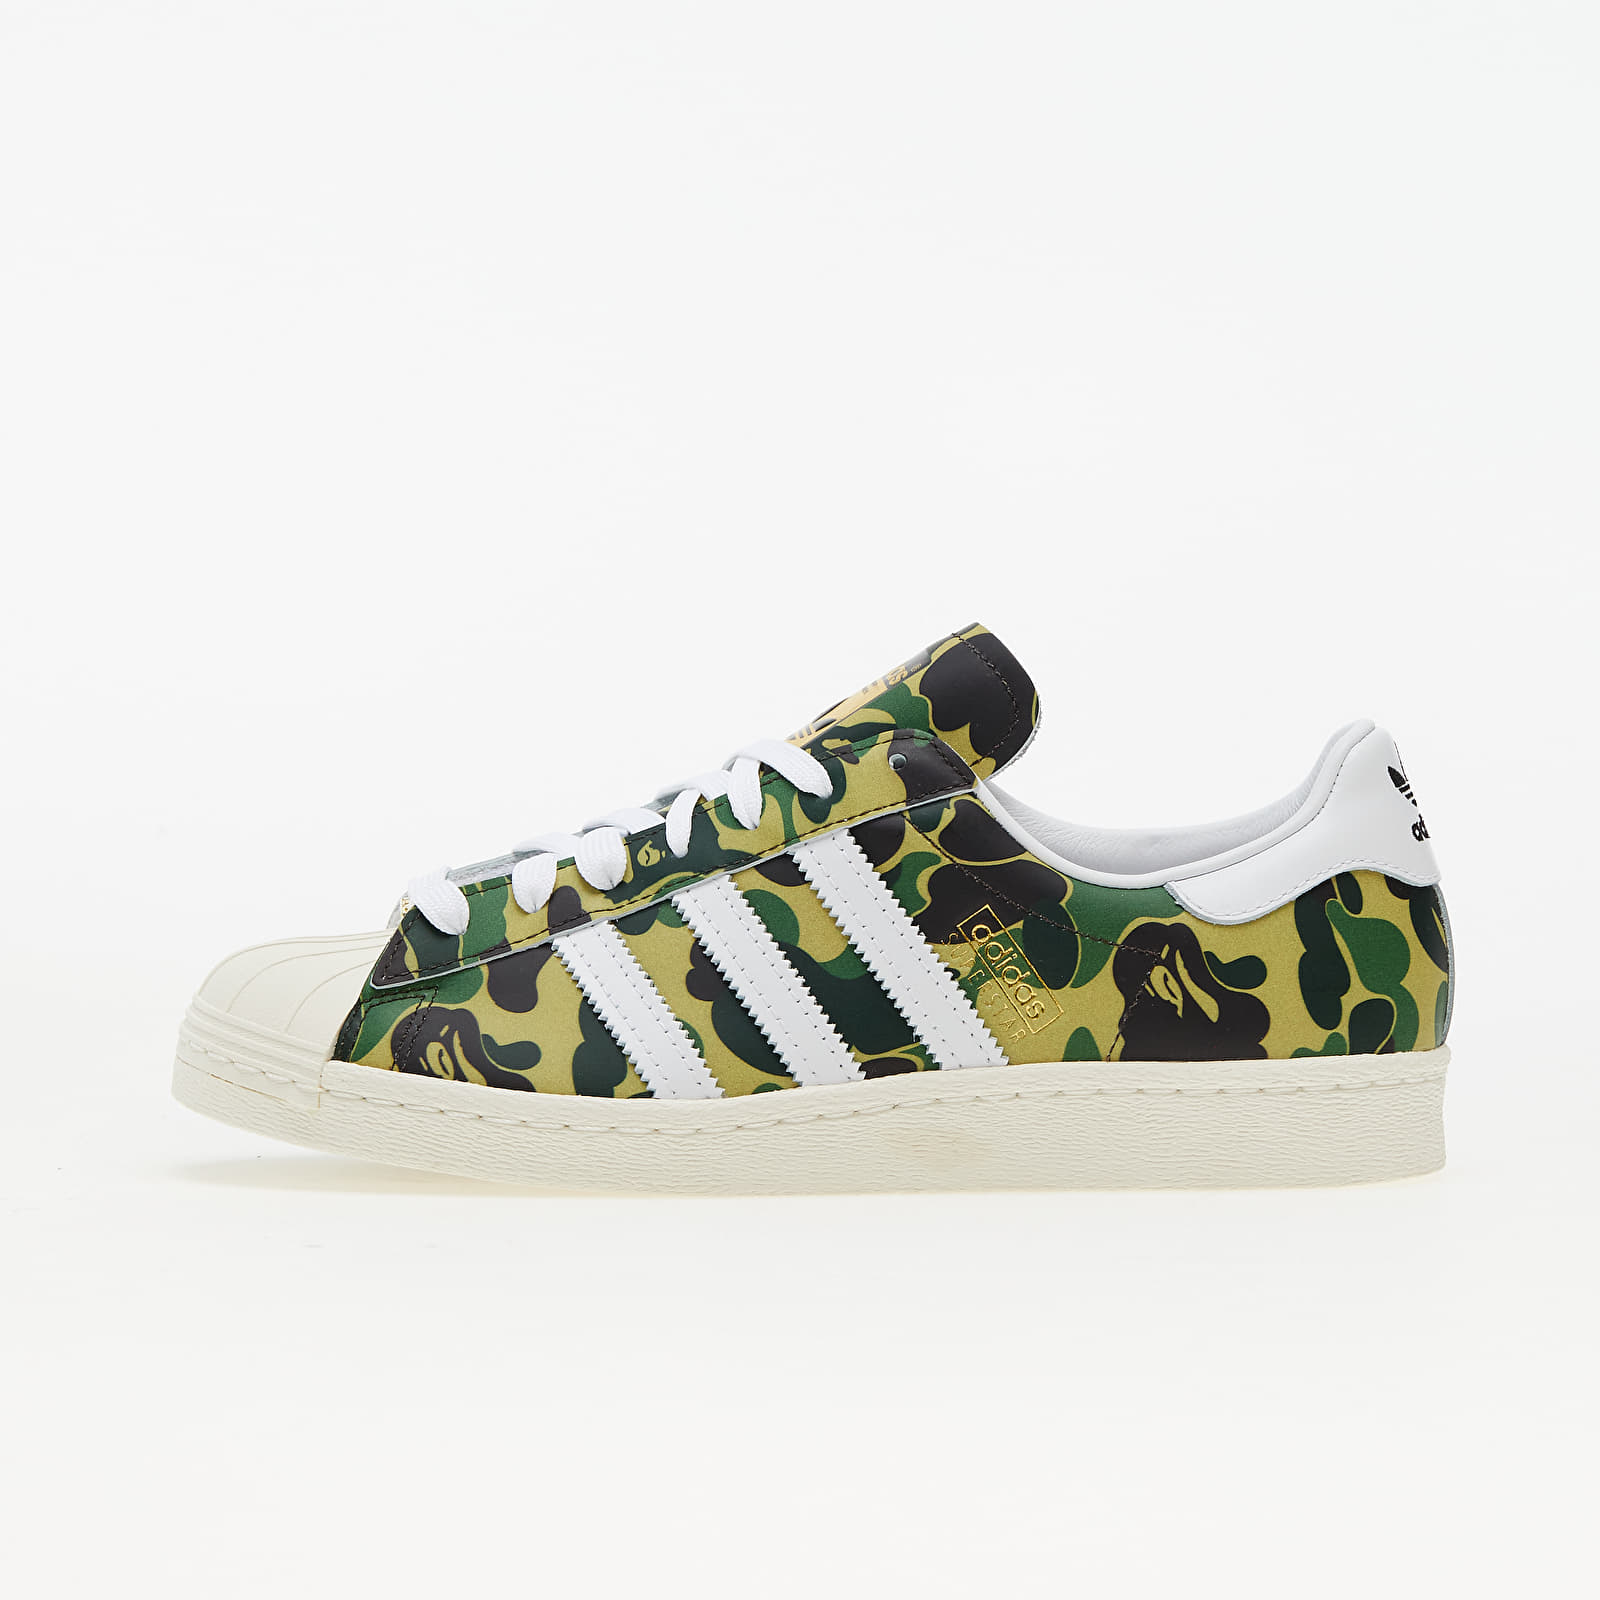 adidas x Bape Superstar 80s Off White/ Ftwr White/ Gold Met. | Footshop